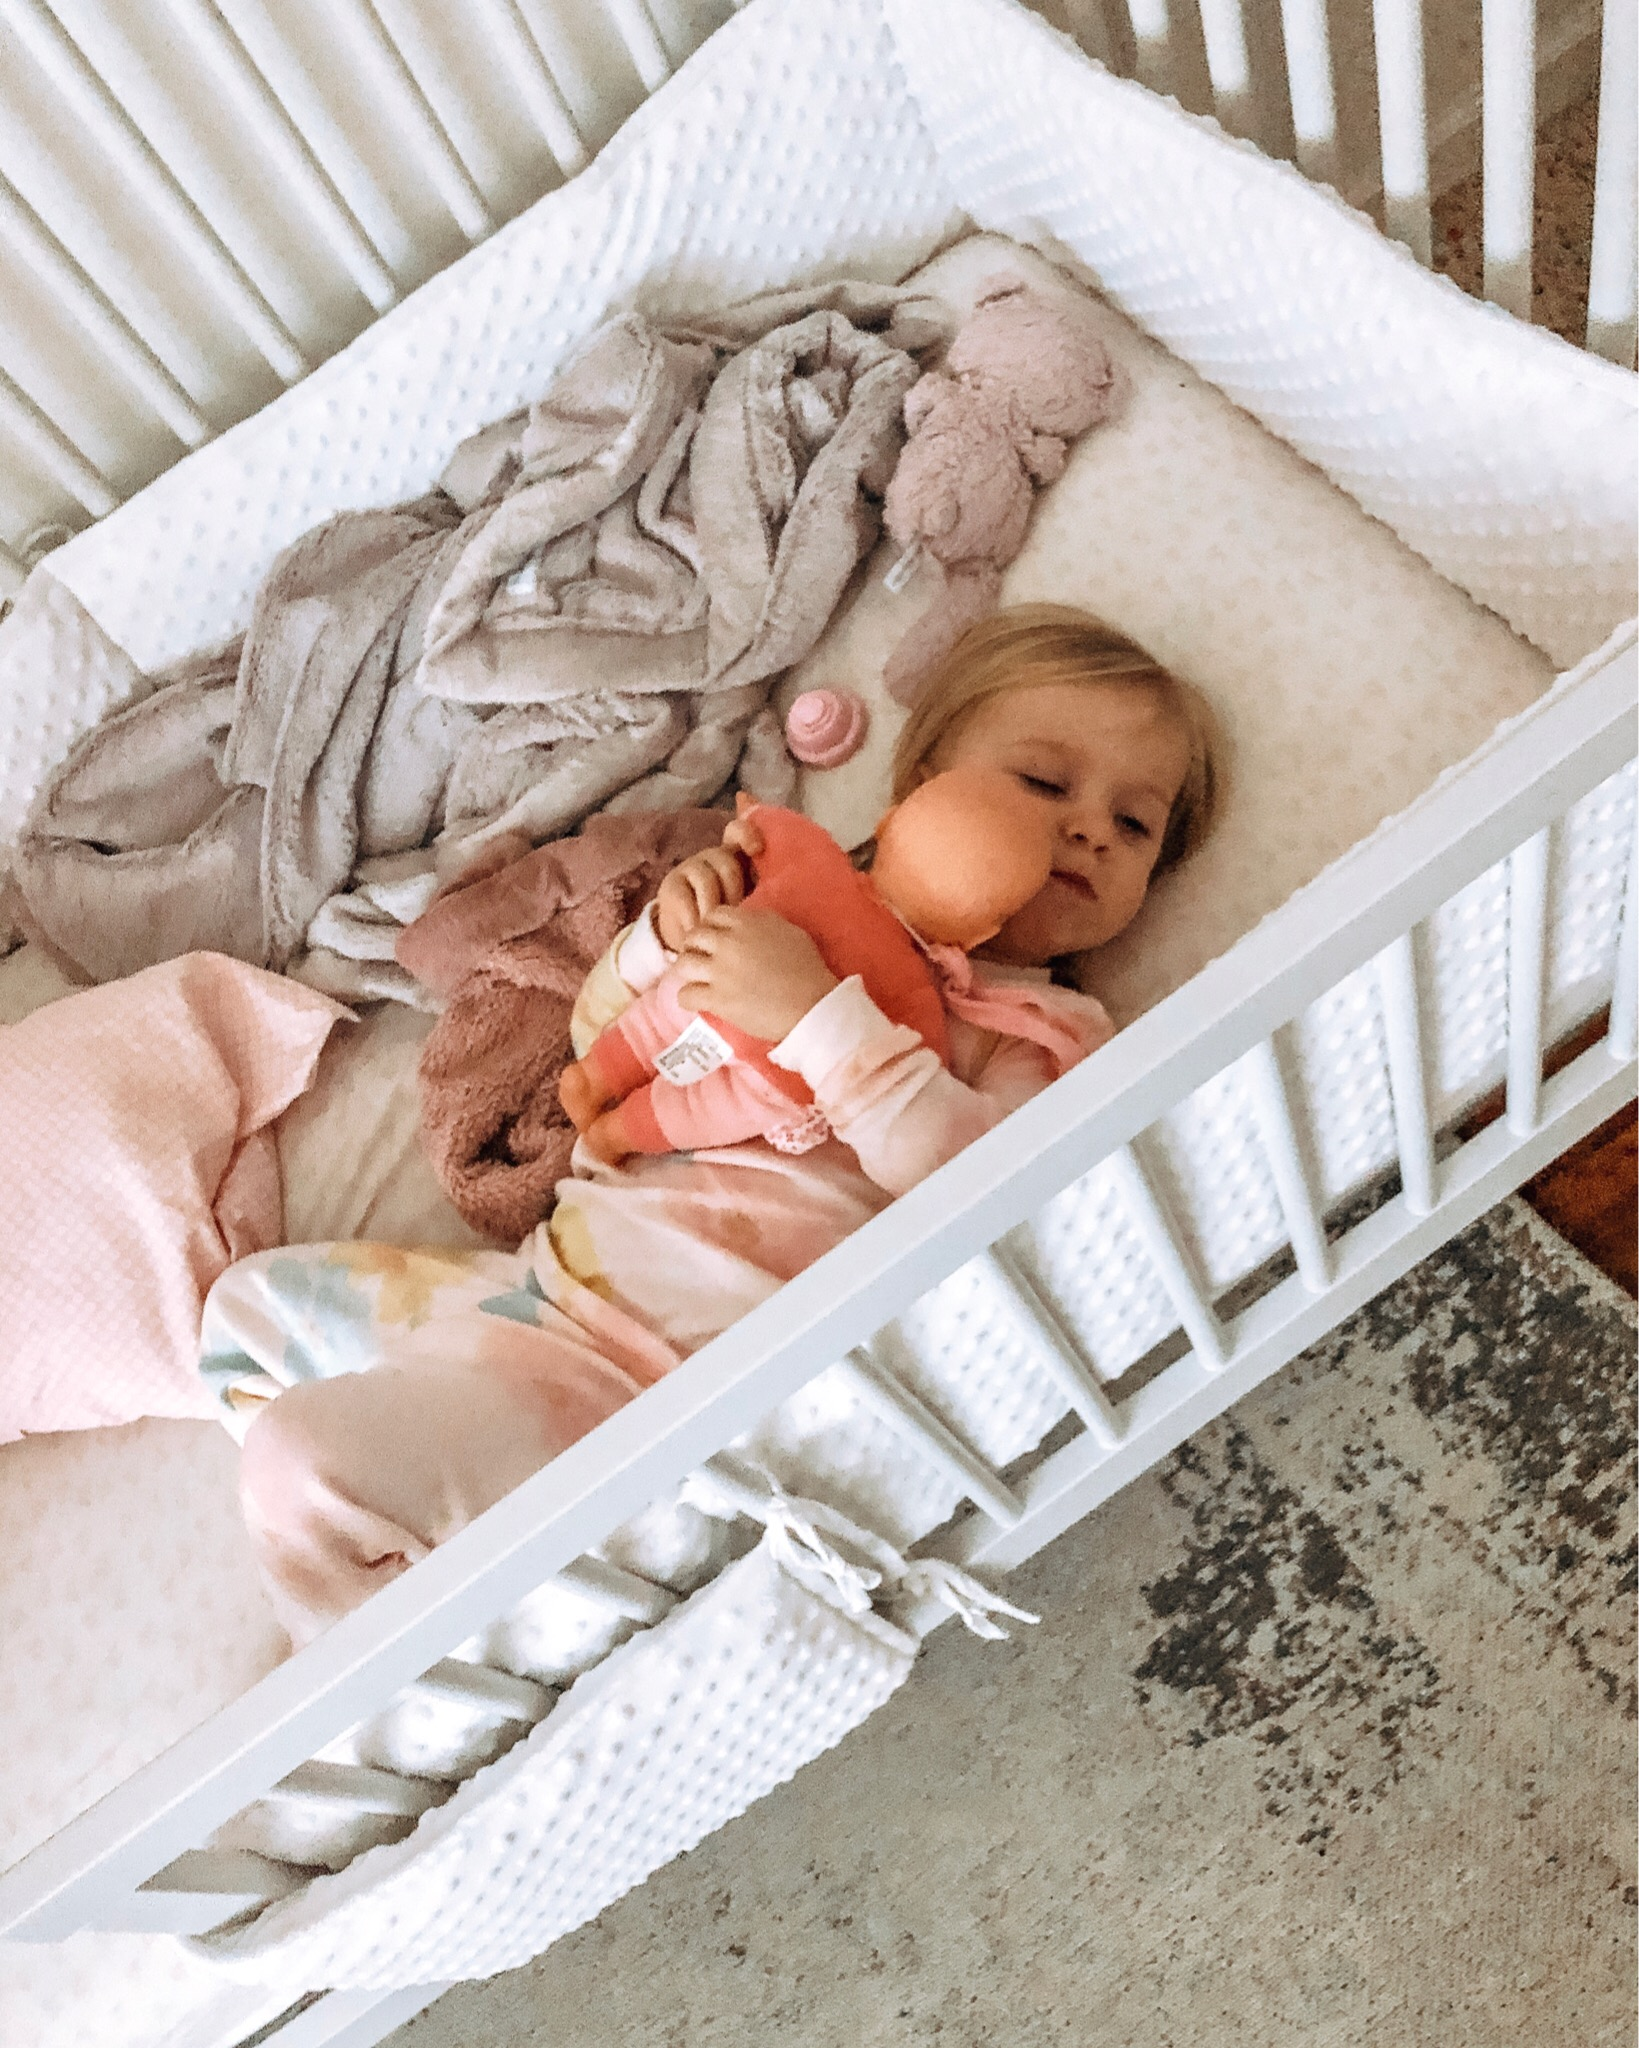 toddlers and sleep